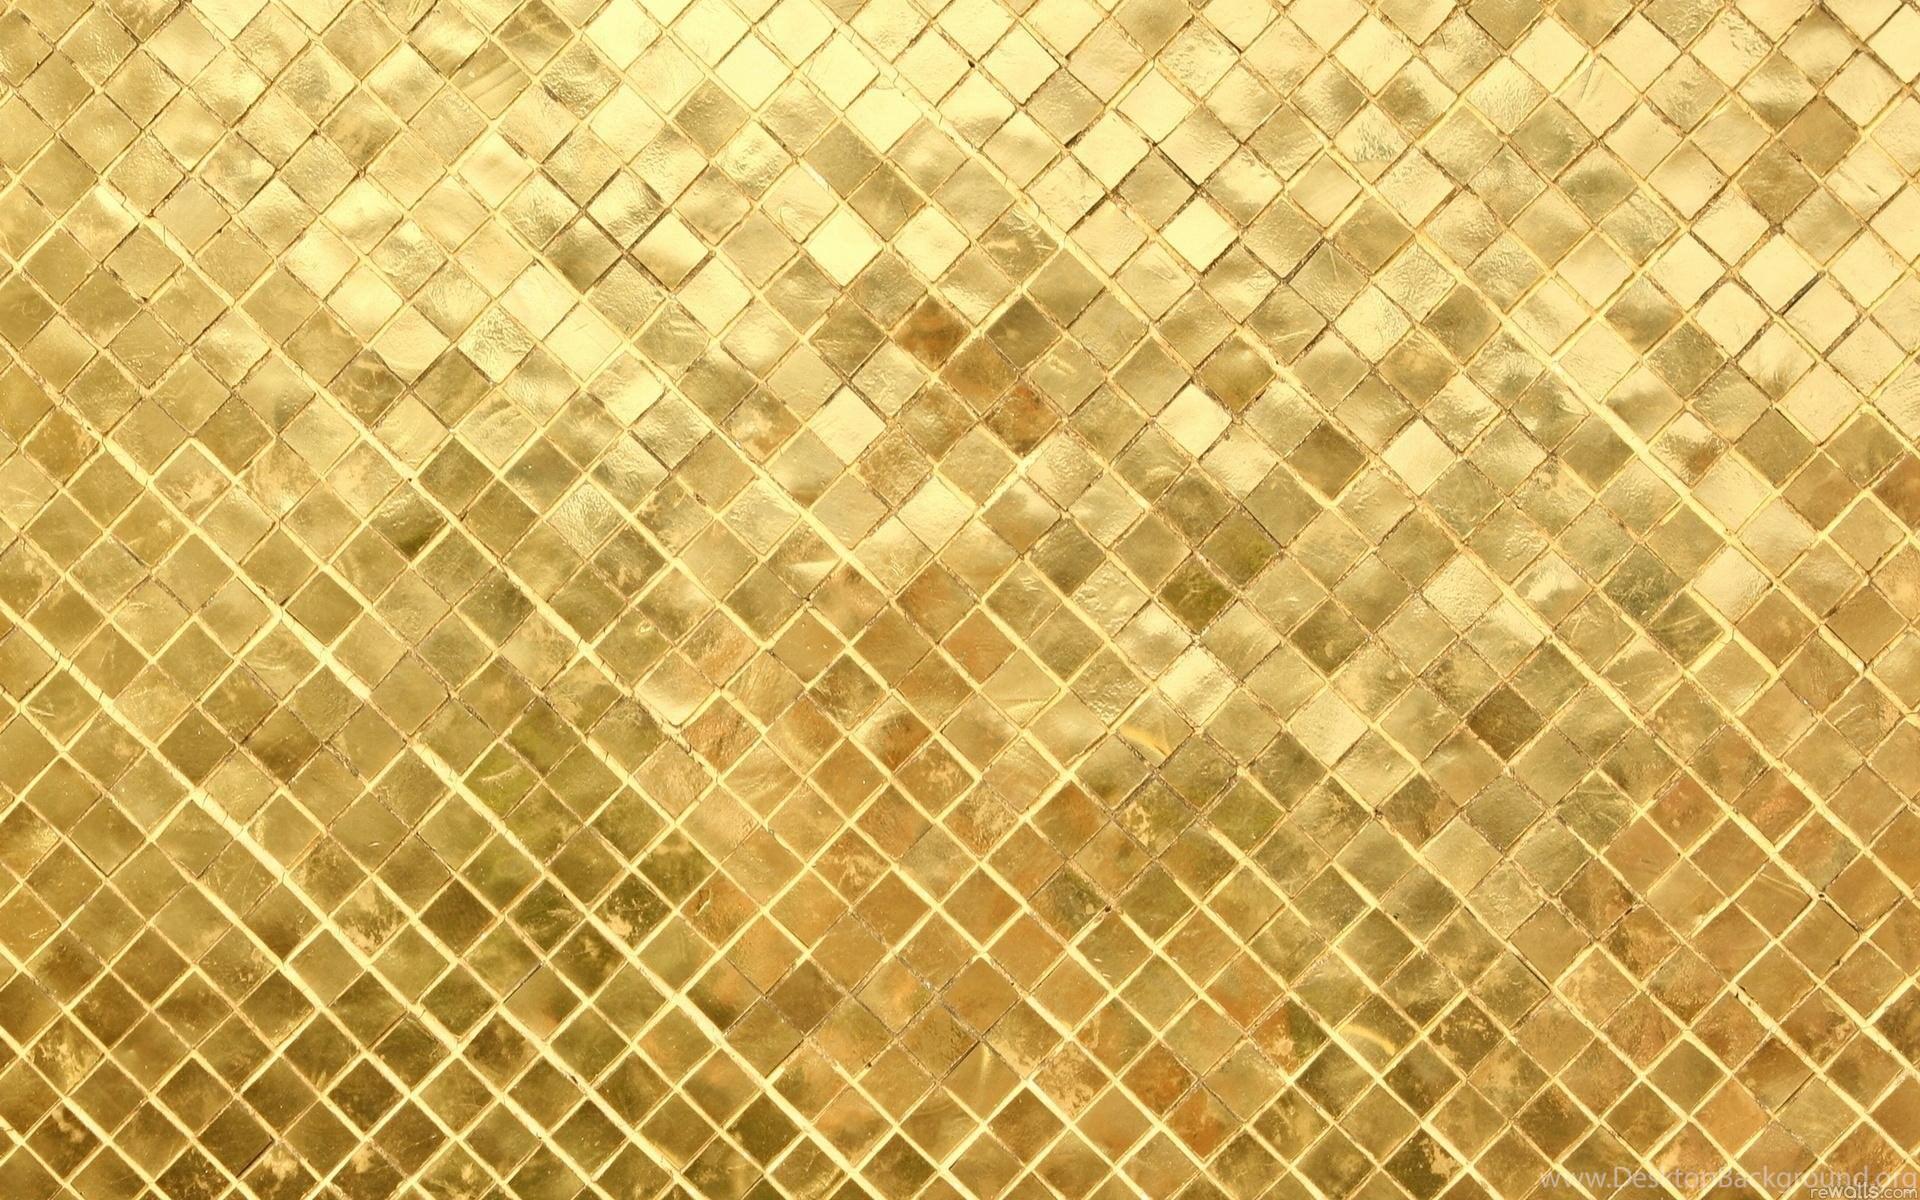 1920x1200px gold texture gold wallpapers hd desktop background